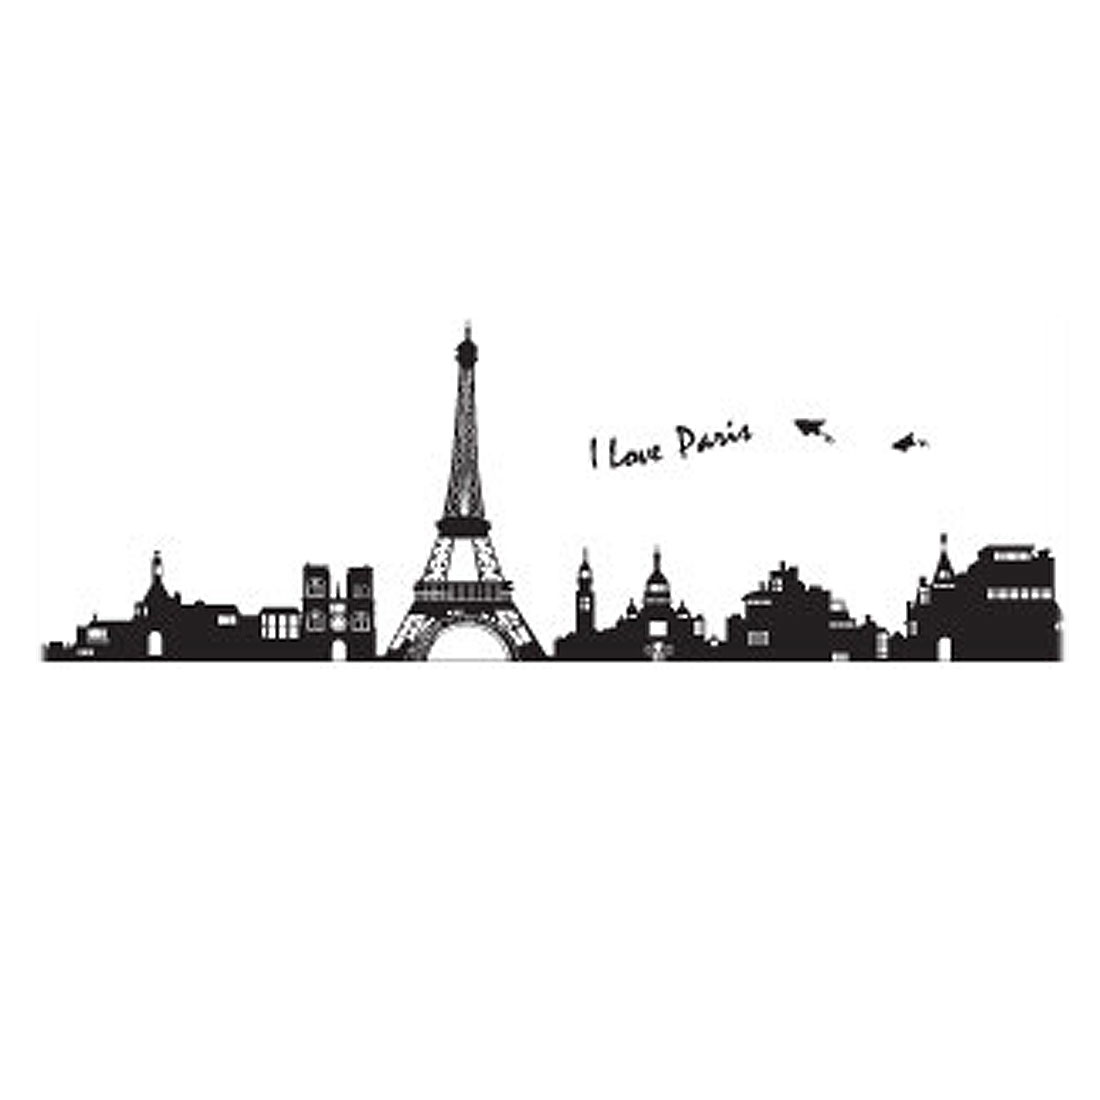 Paris eiffel tower diy home room decal wall decor sticker 60x90cm paris eiffel tower diy home room decal wall decor sticker 60x90cm walmart amipublicfo Gallery